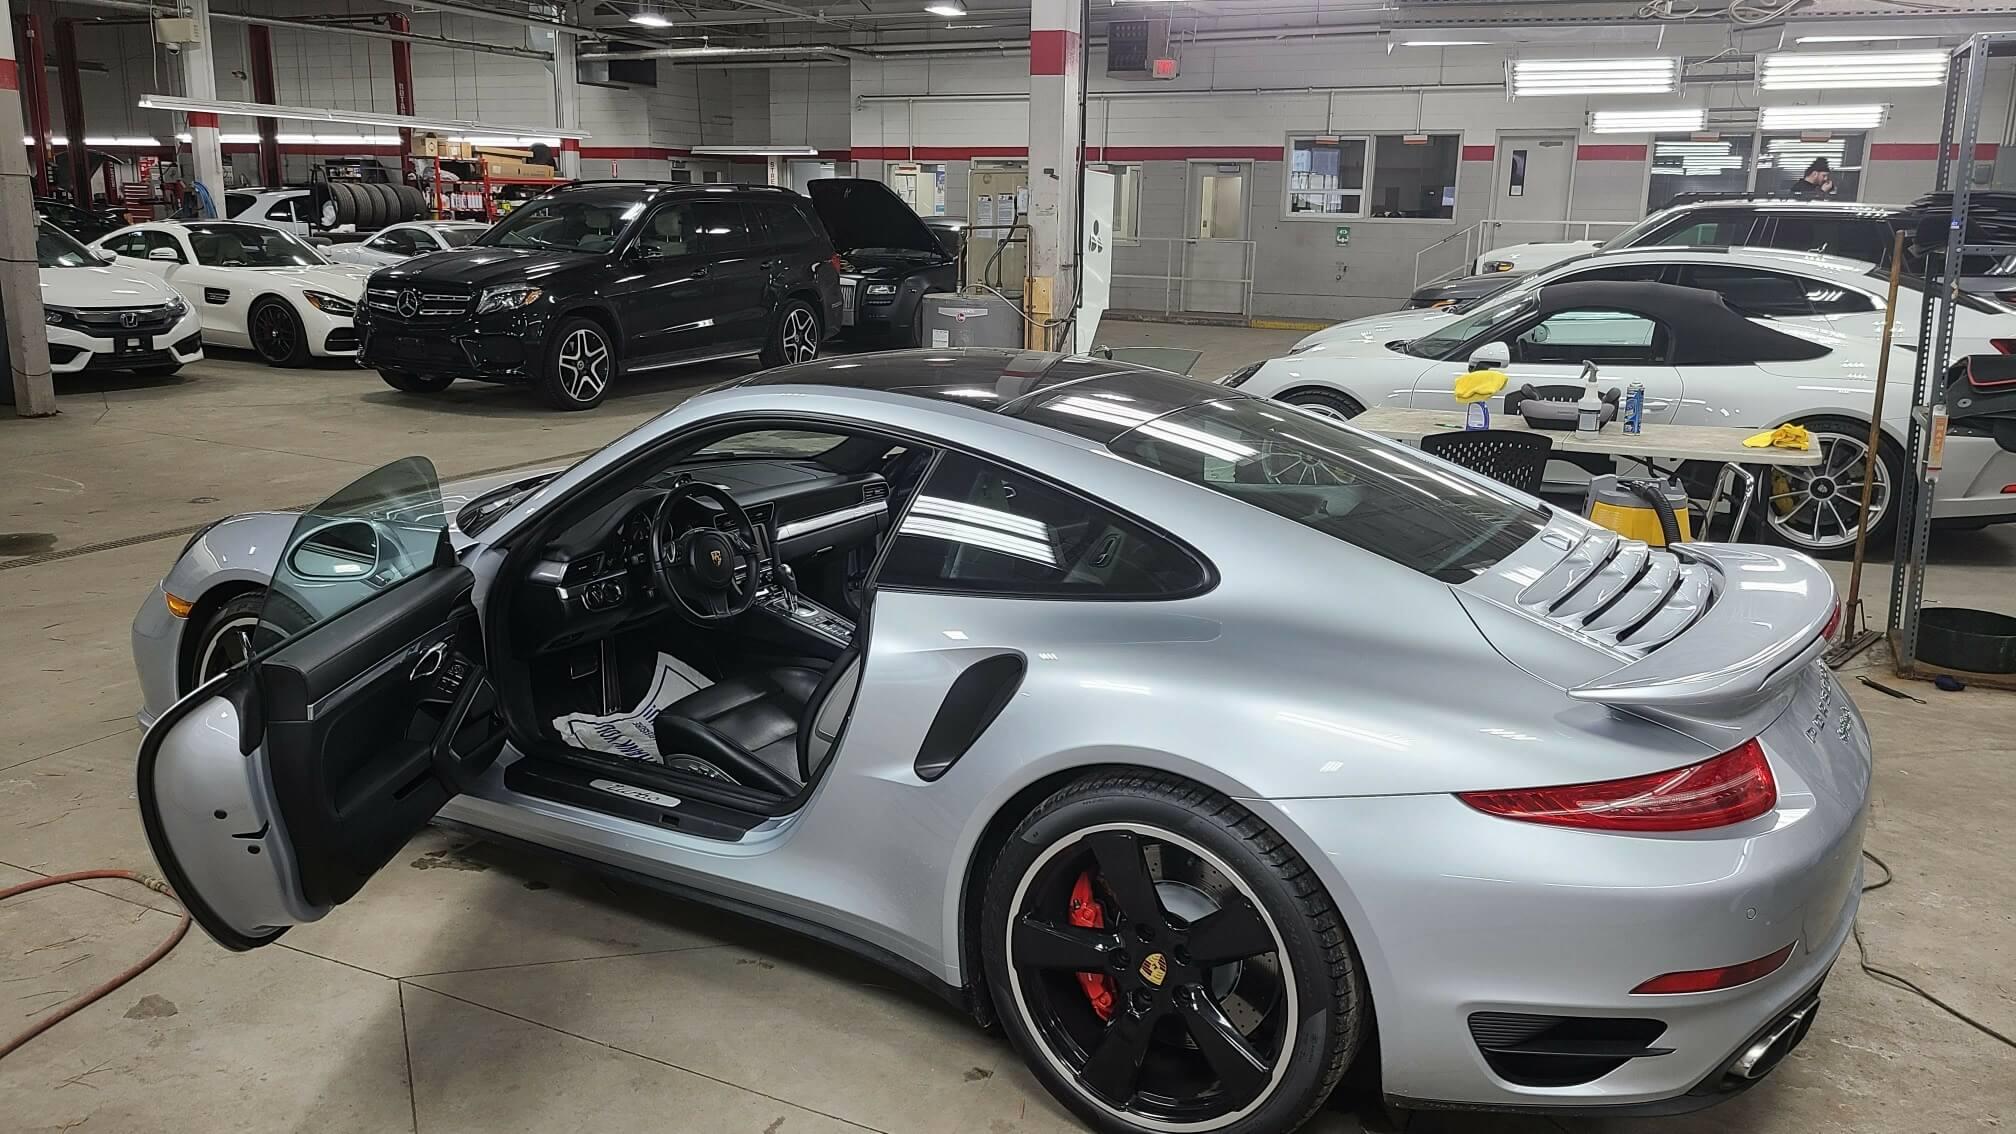 Porsche 911 Detailing